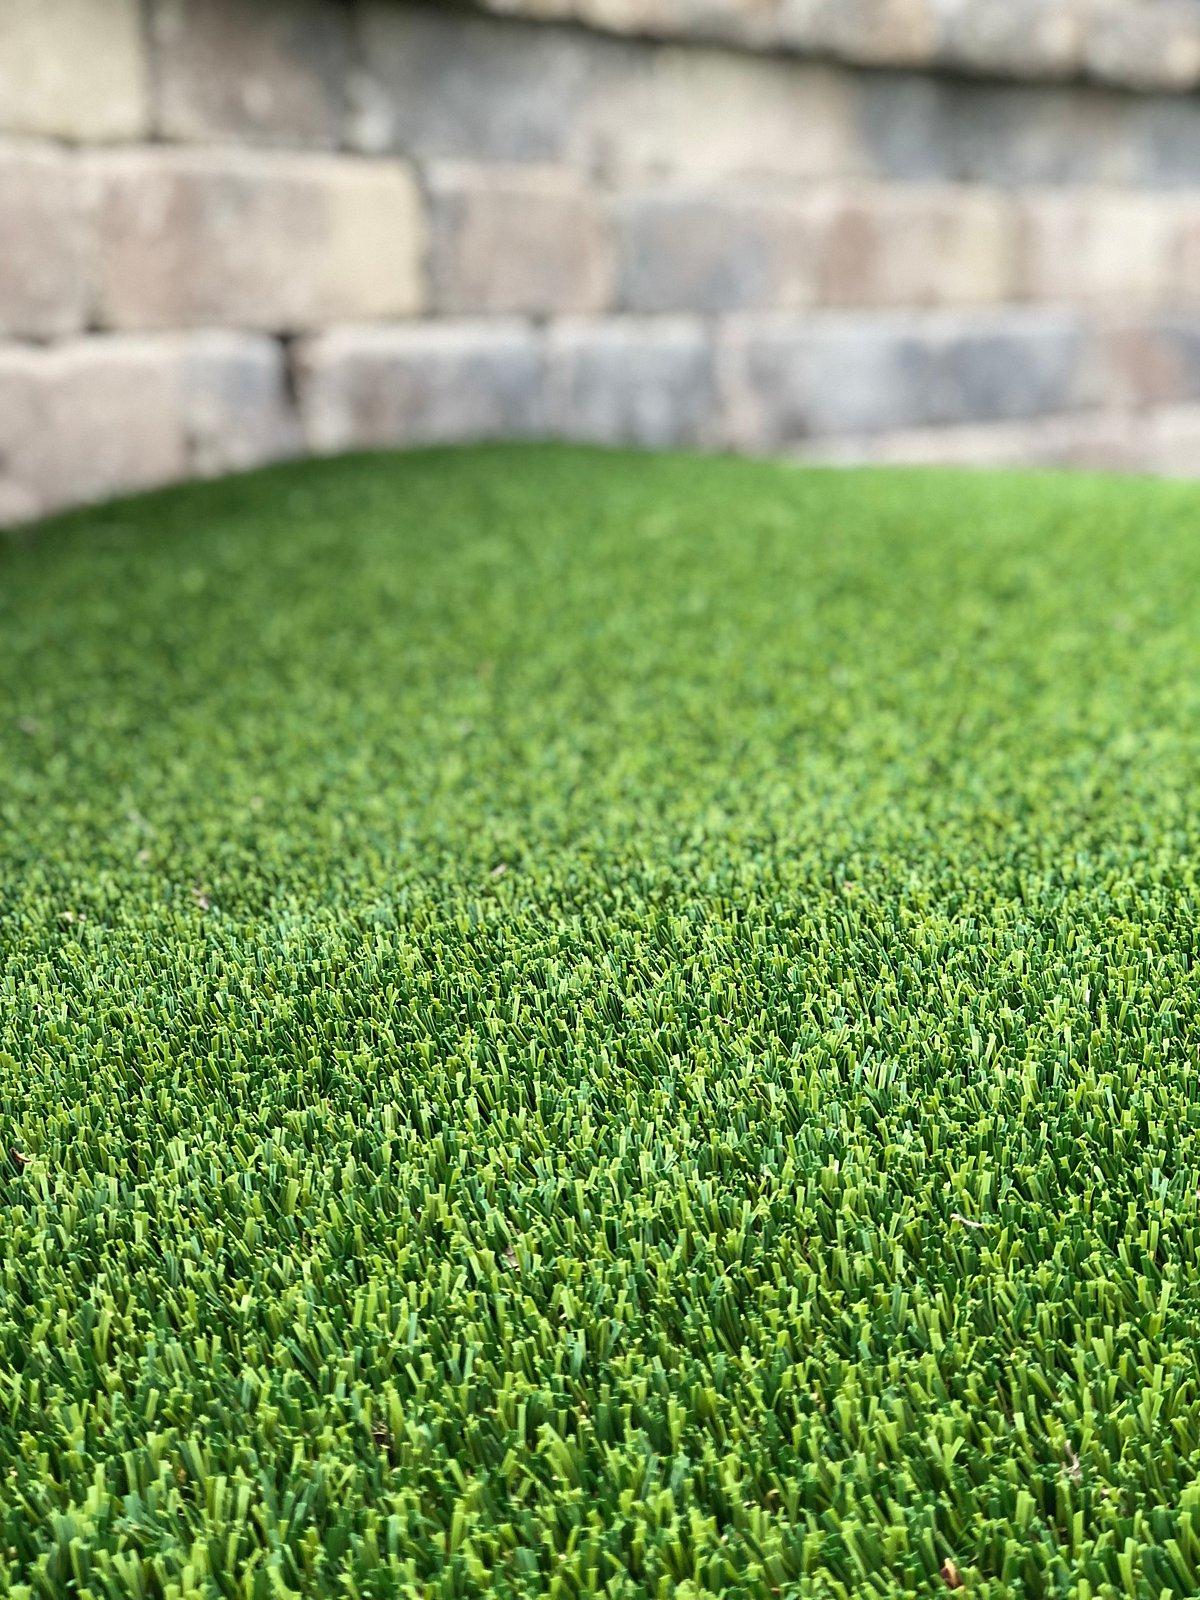 pet turf-pet grass-pet-grass-lawn-artificial-turf-chicago-turf company-fake grass-dog-pet run-dog run